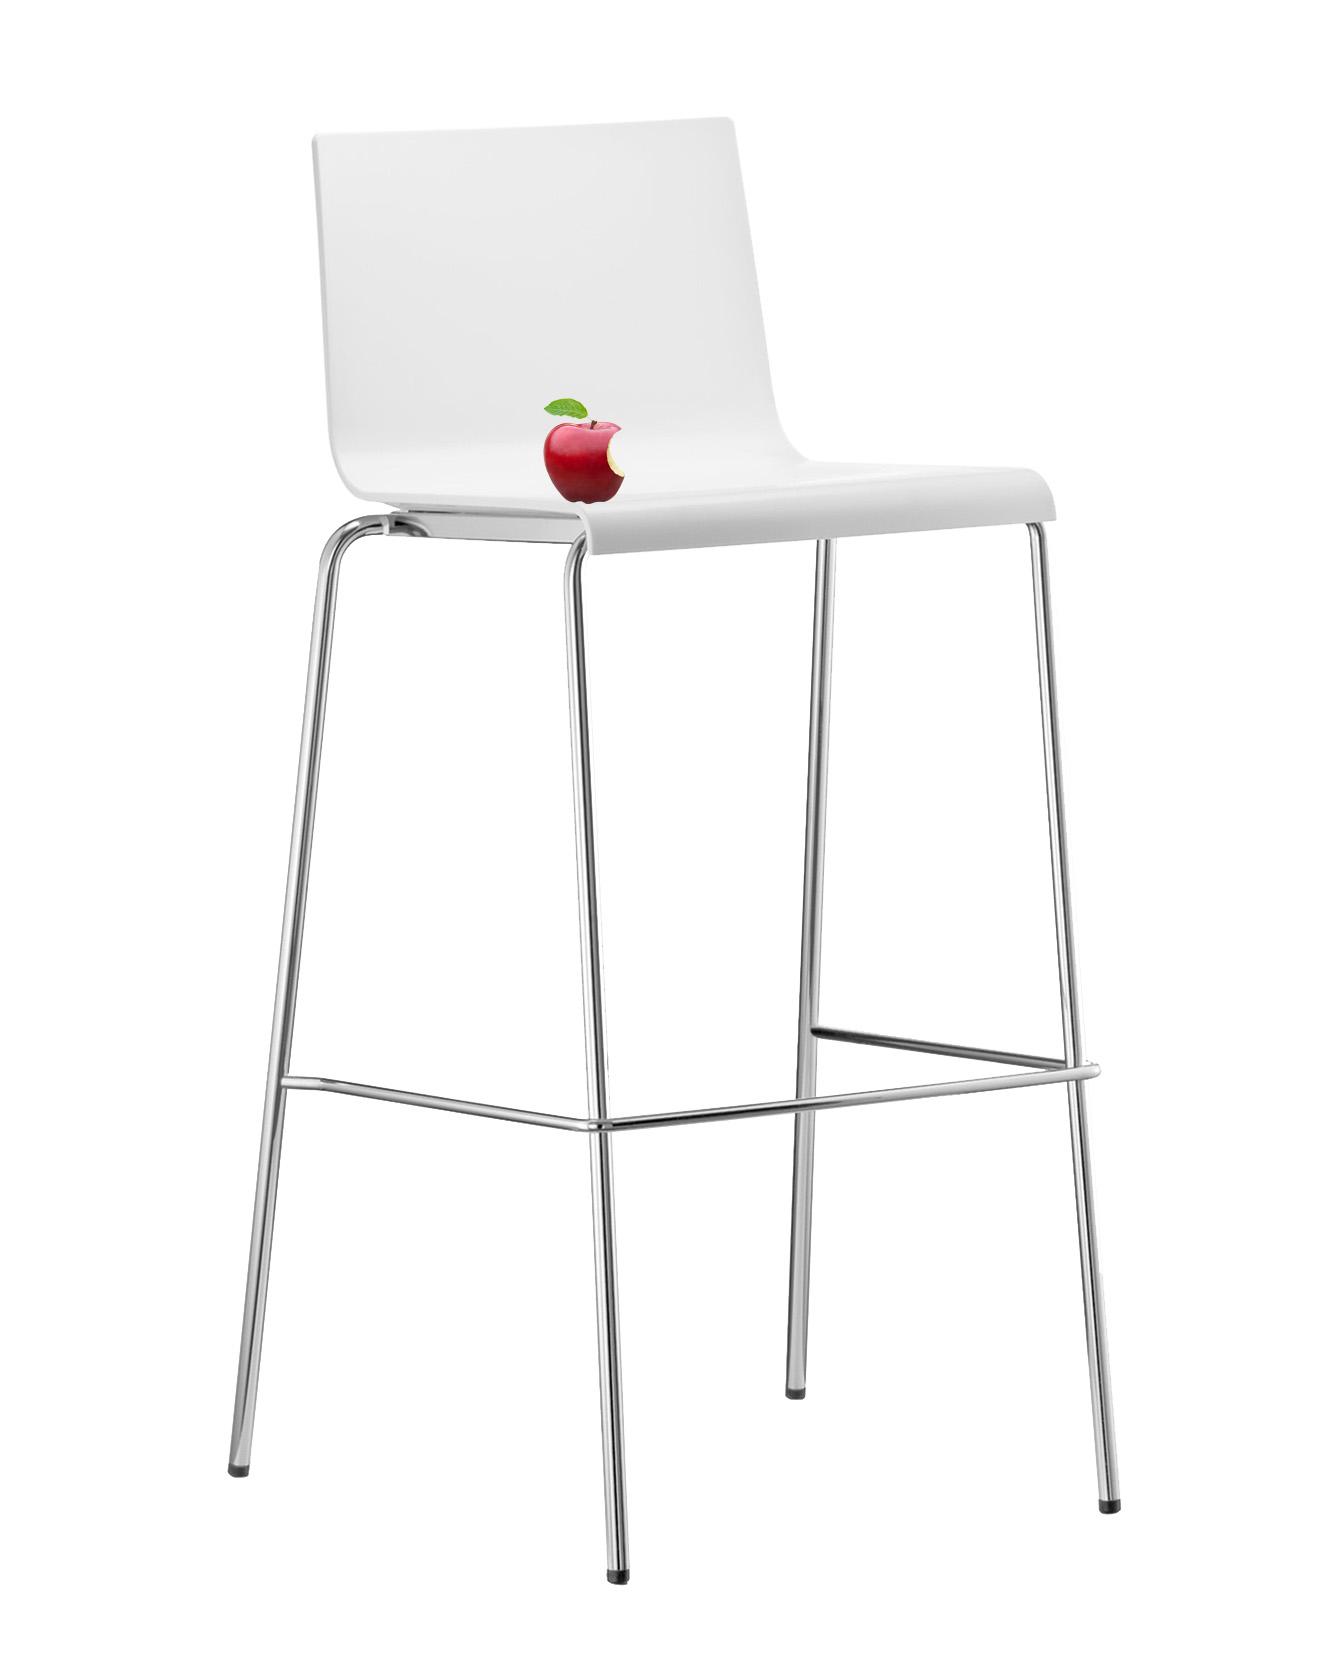 Barhocker Kuadra 1112 (Pedrali, Designer-Tresenhocker / Barstuhl) extrem robust & langlebig, weiß, perfekt für Events & Gastro